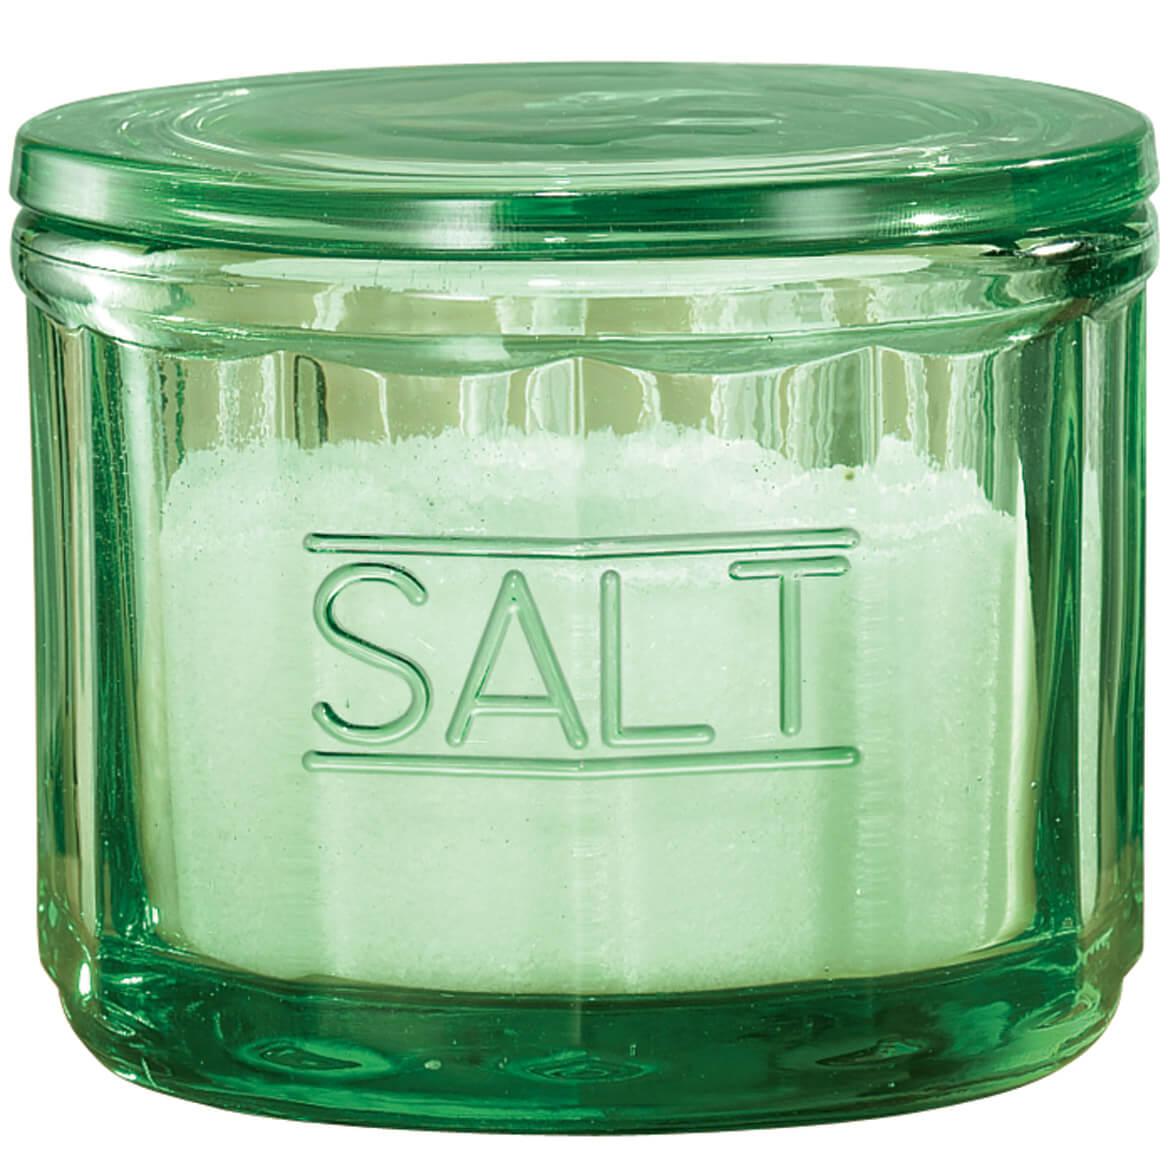 Classic Green Salt Cellar